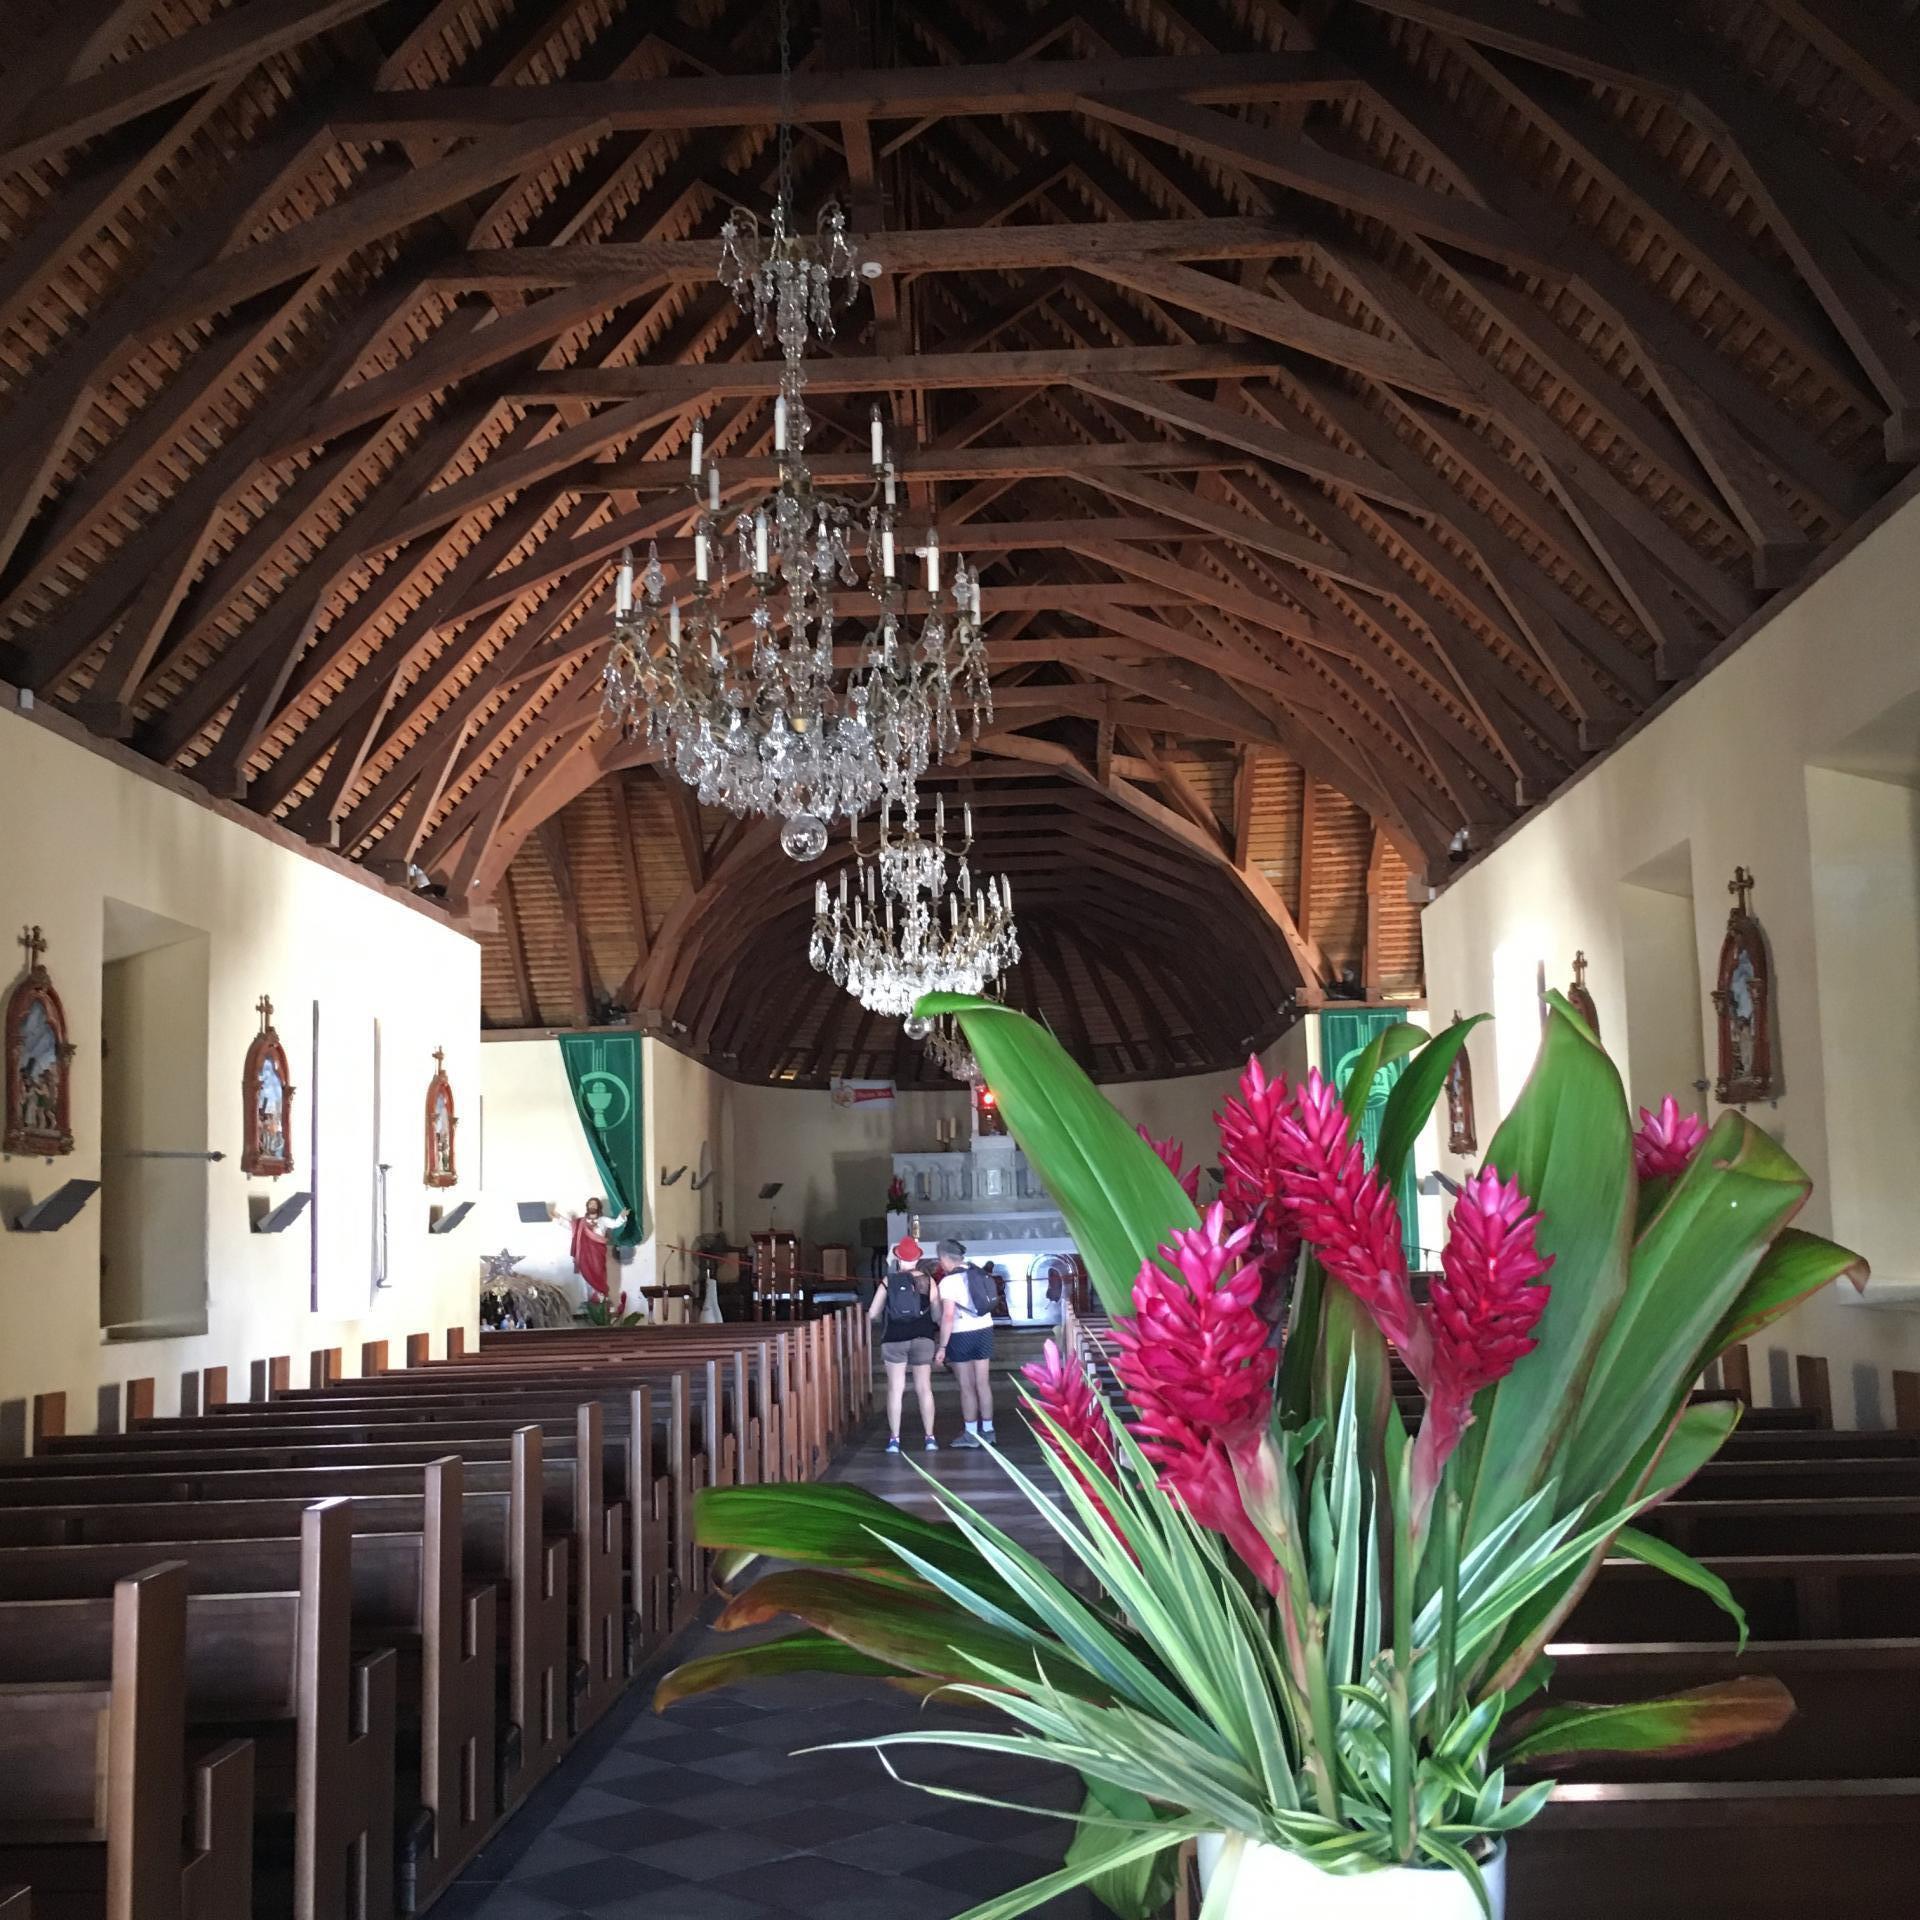 L'église de Ste-Anne